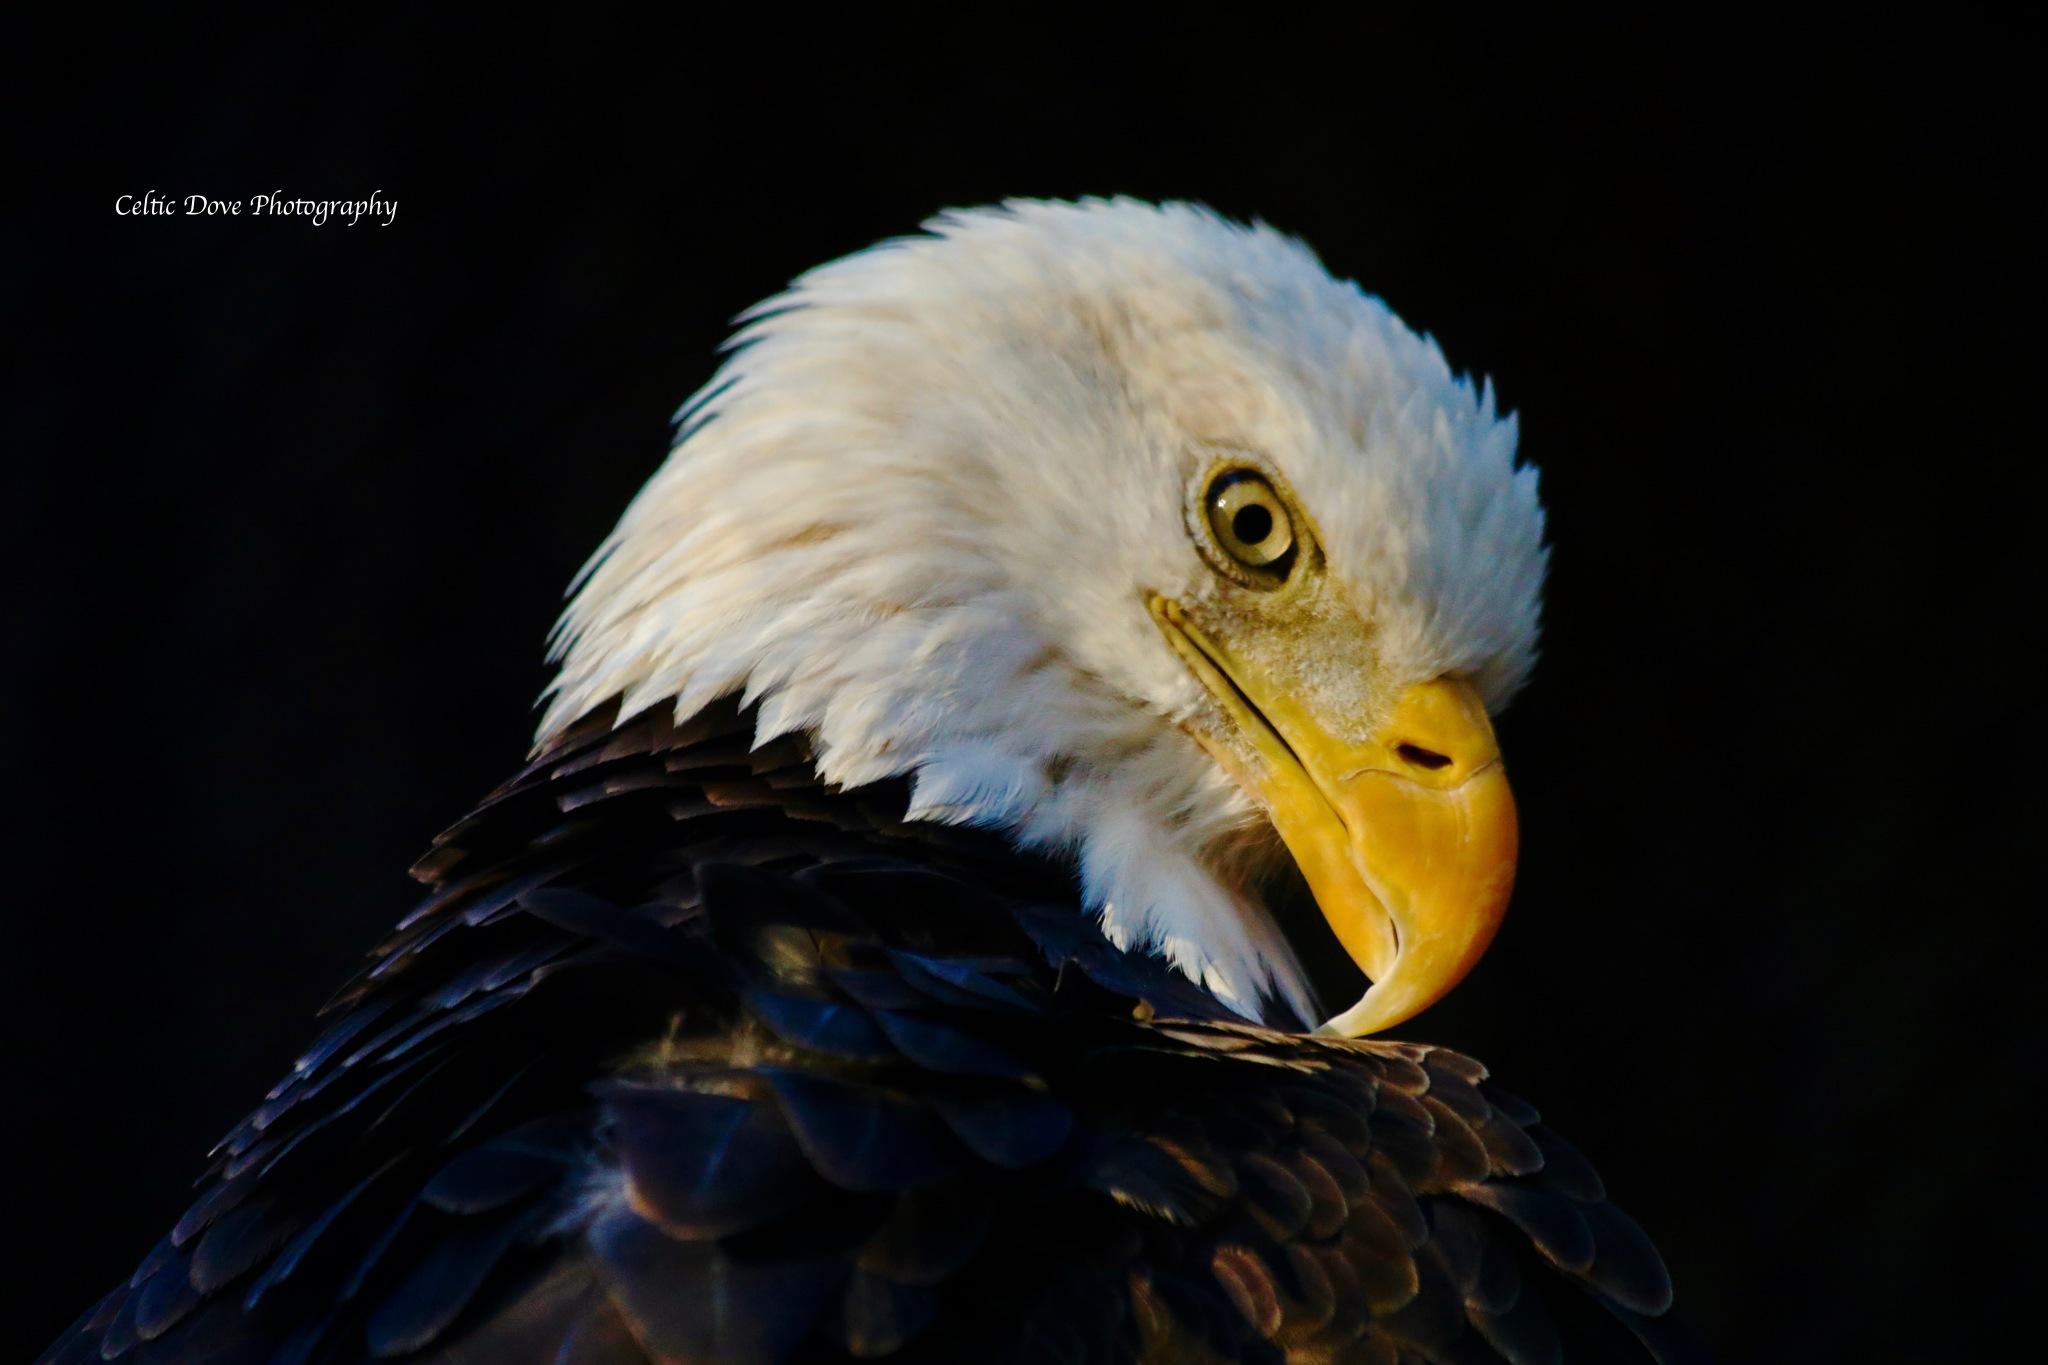 Golden Eagle by CelticDove